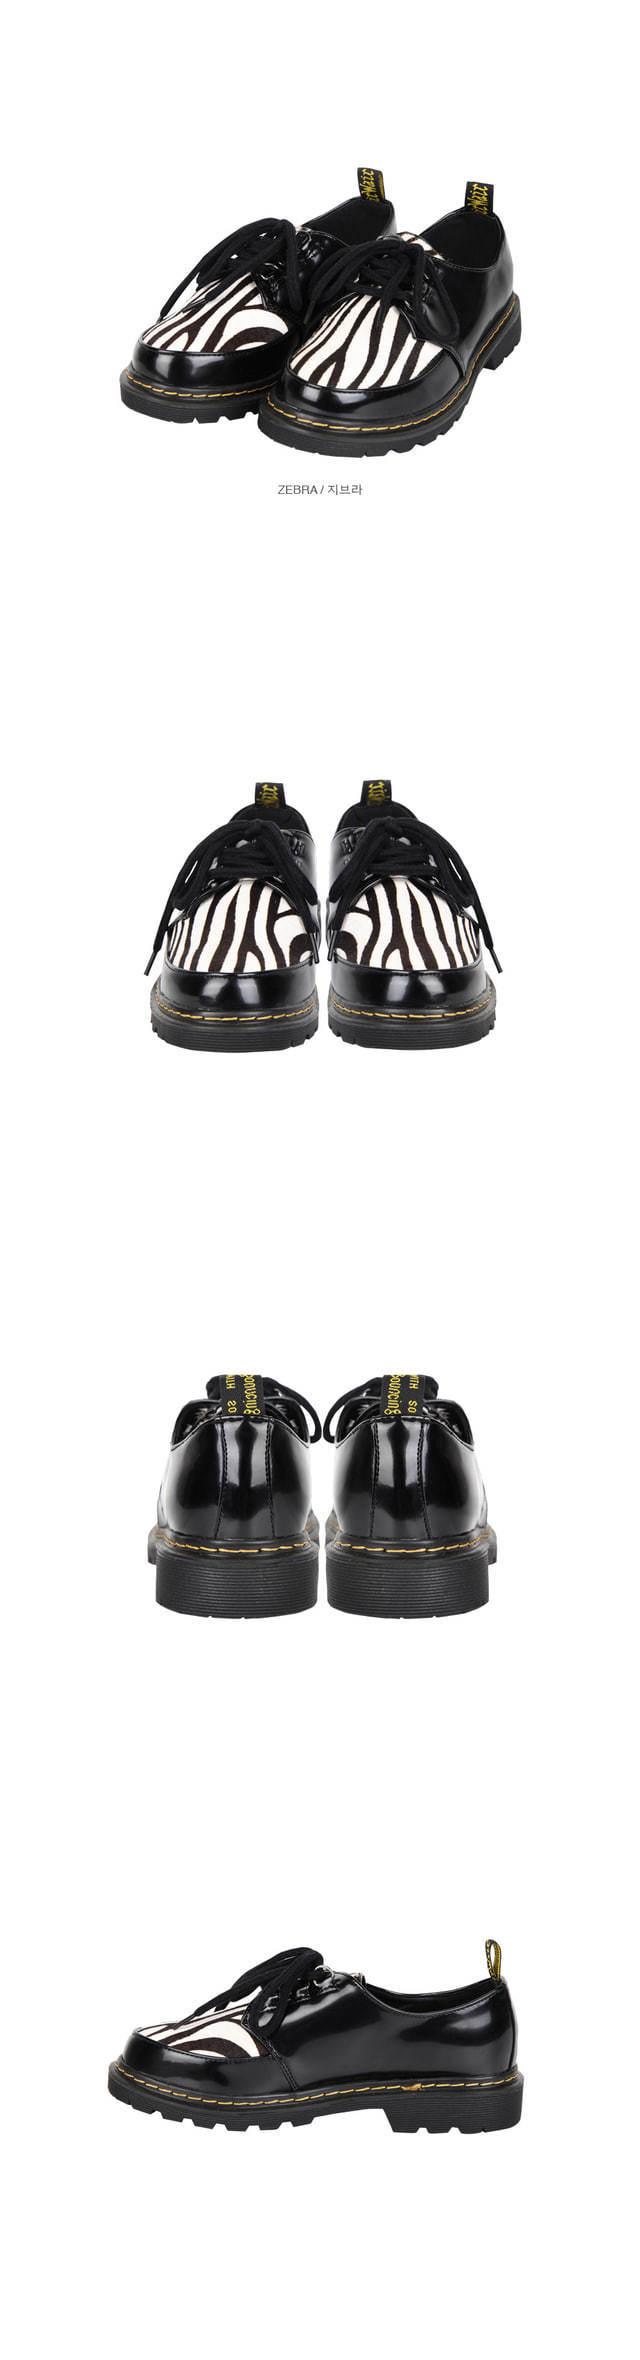 zebra creeper